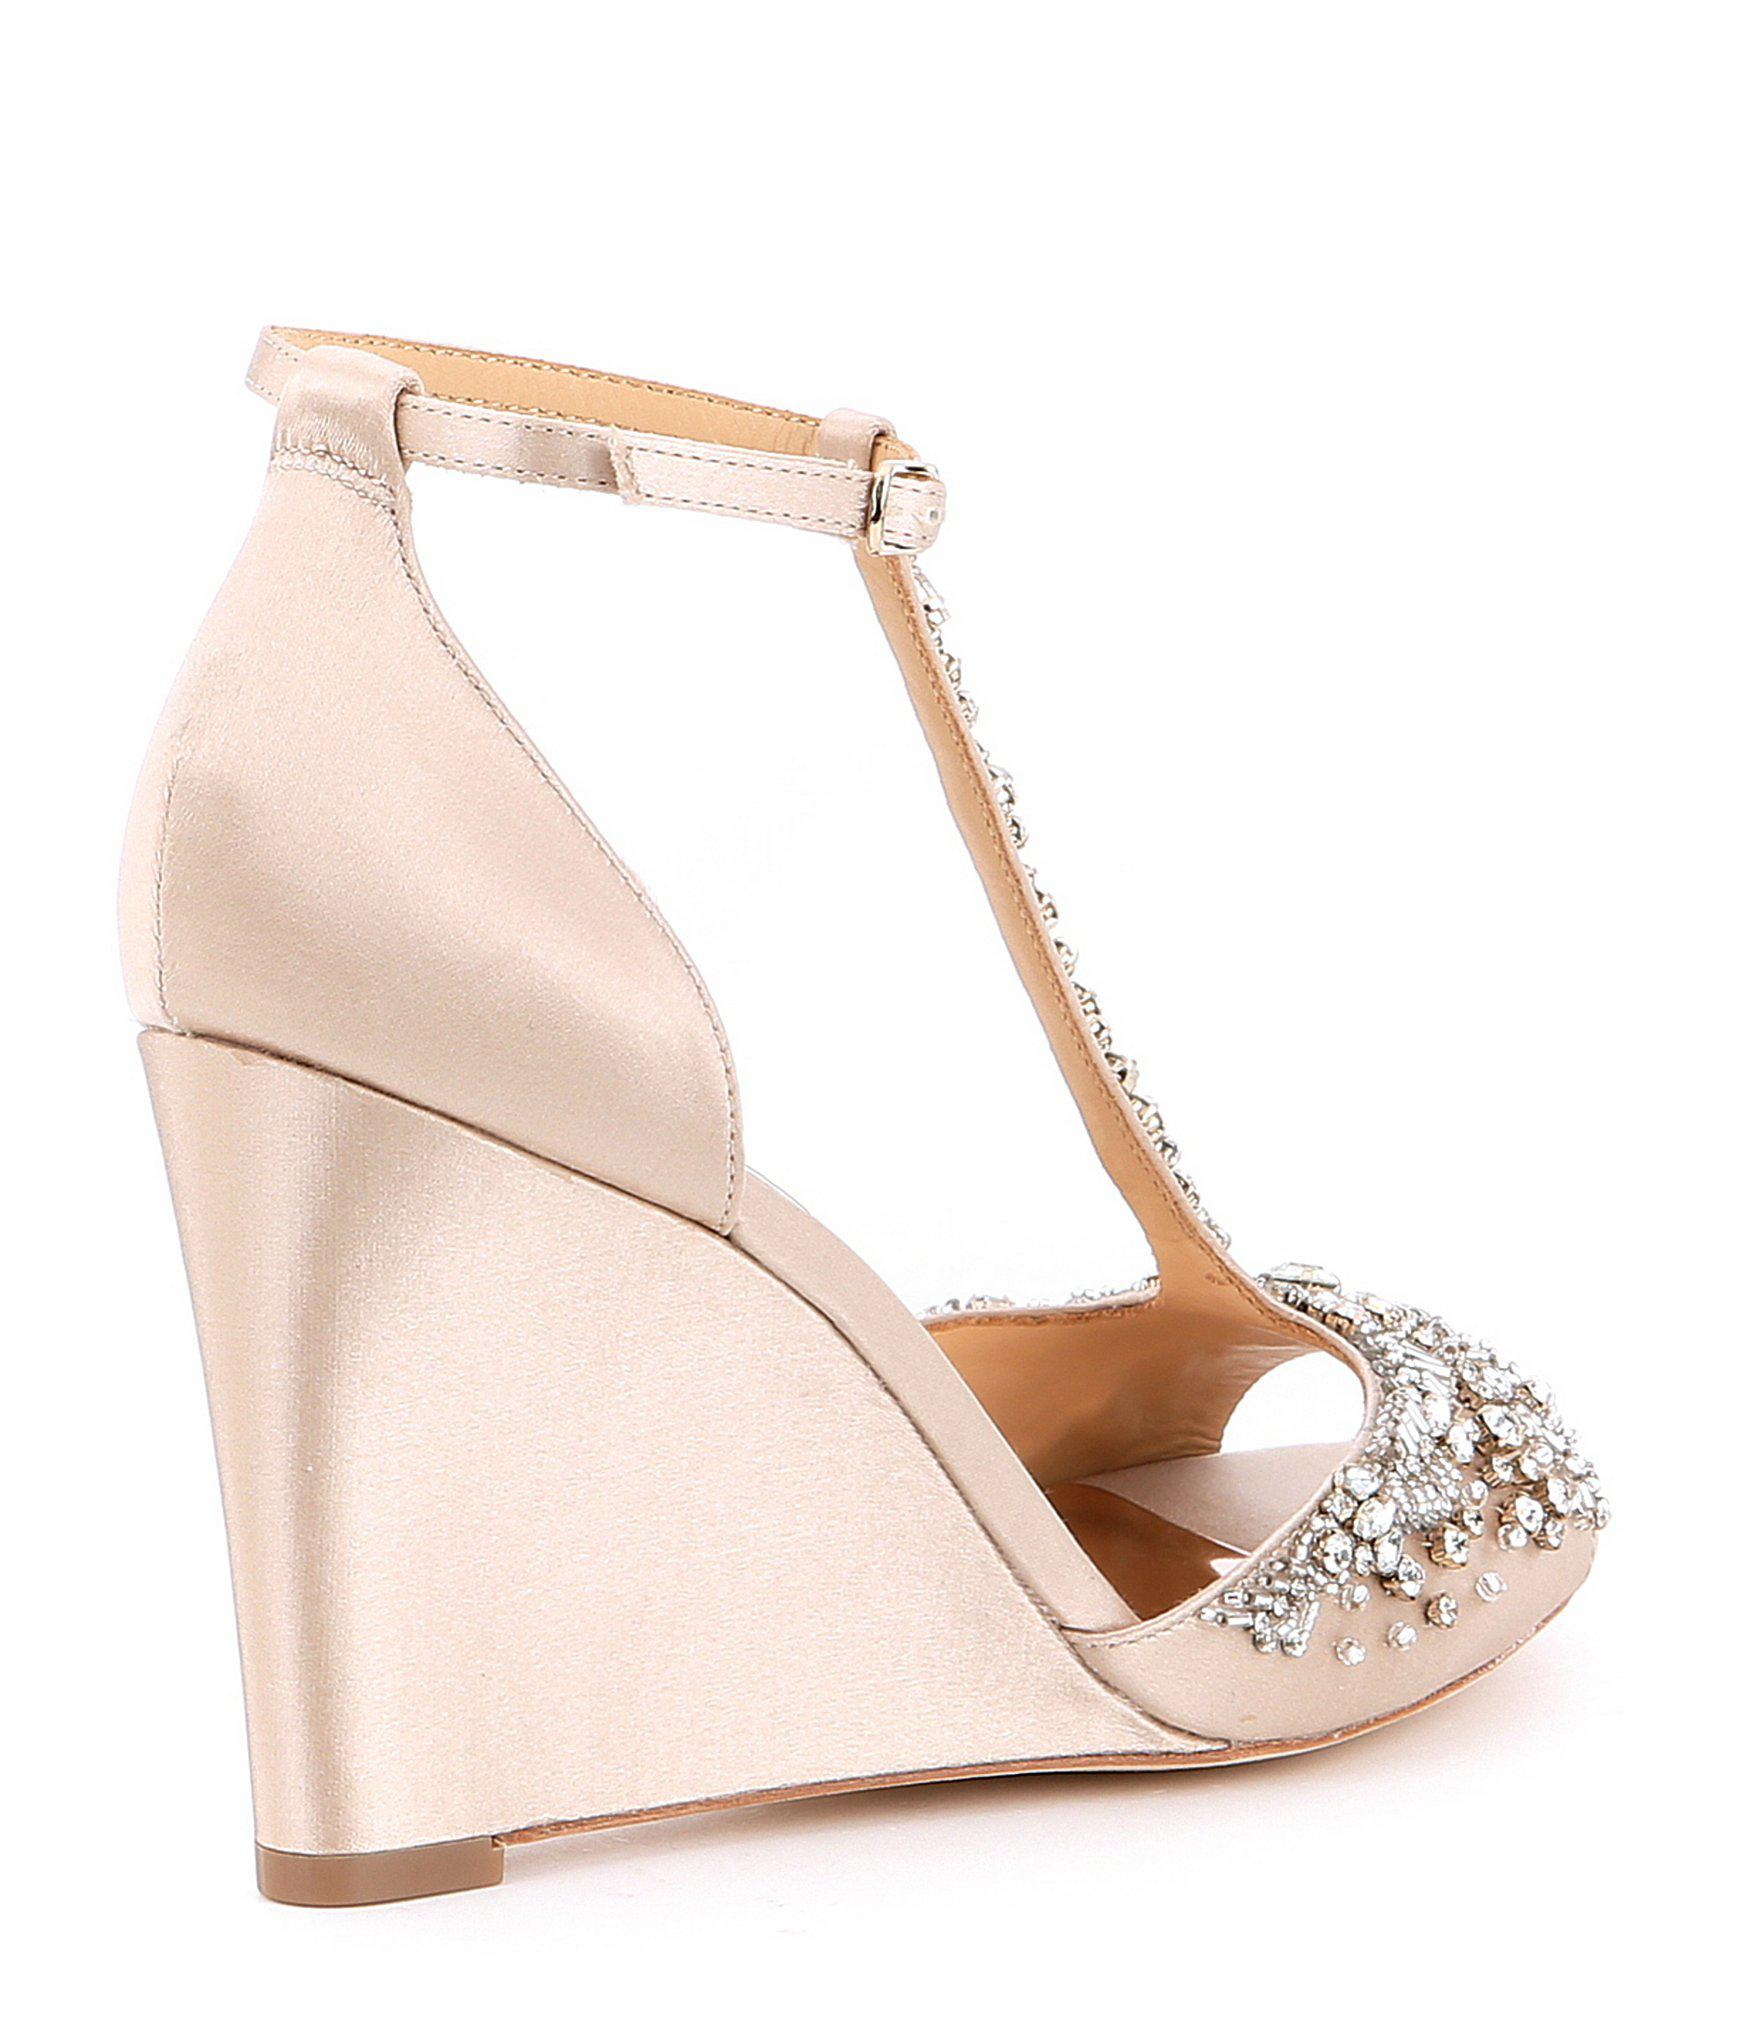 75430daa8fa Badgley Mischka - Natural Sarah T-strap Wedge Dress Sandals - Lyst. View  fullscreen